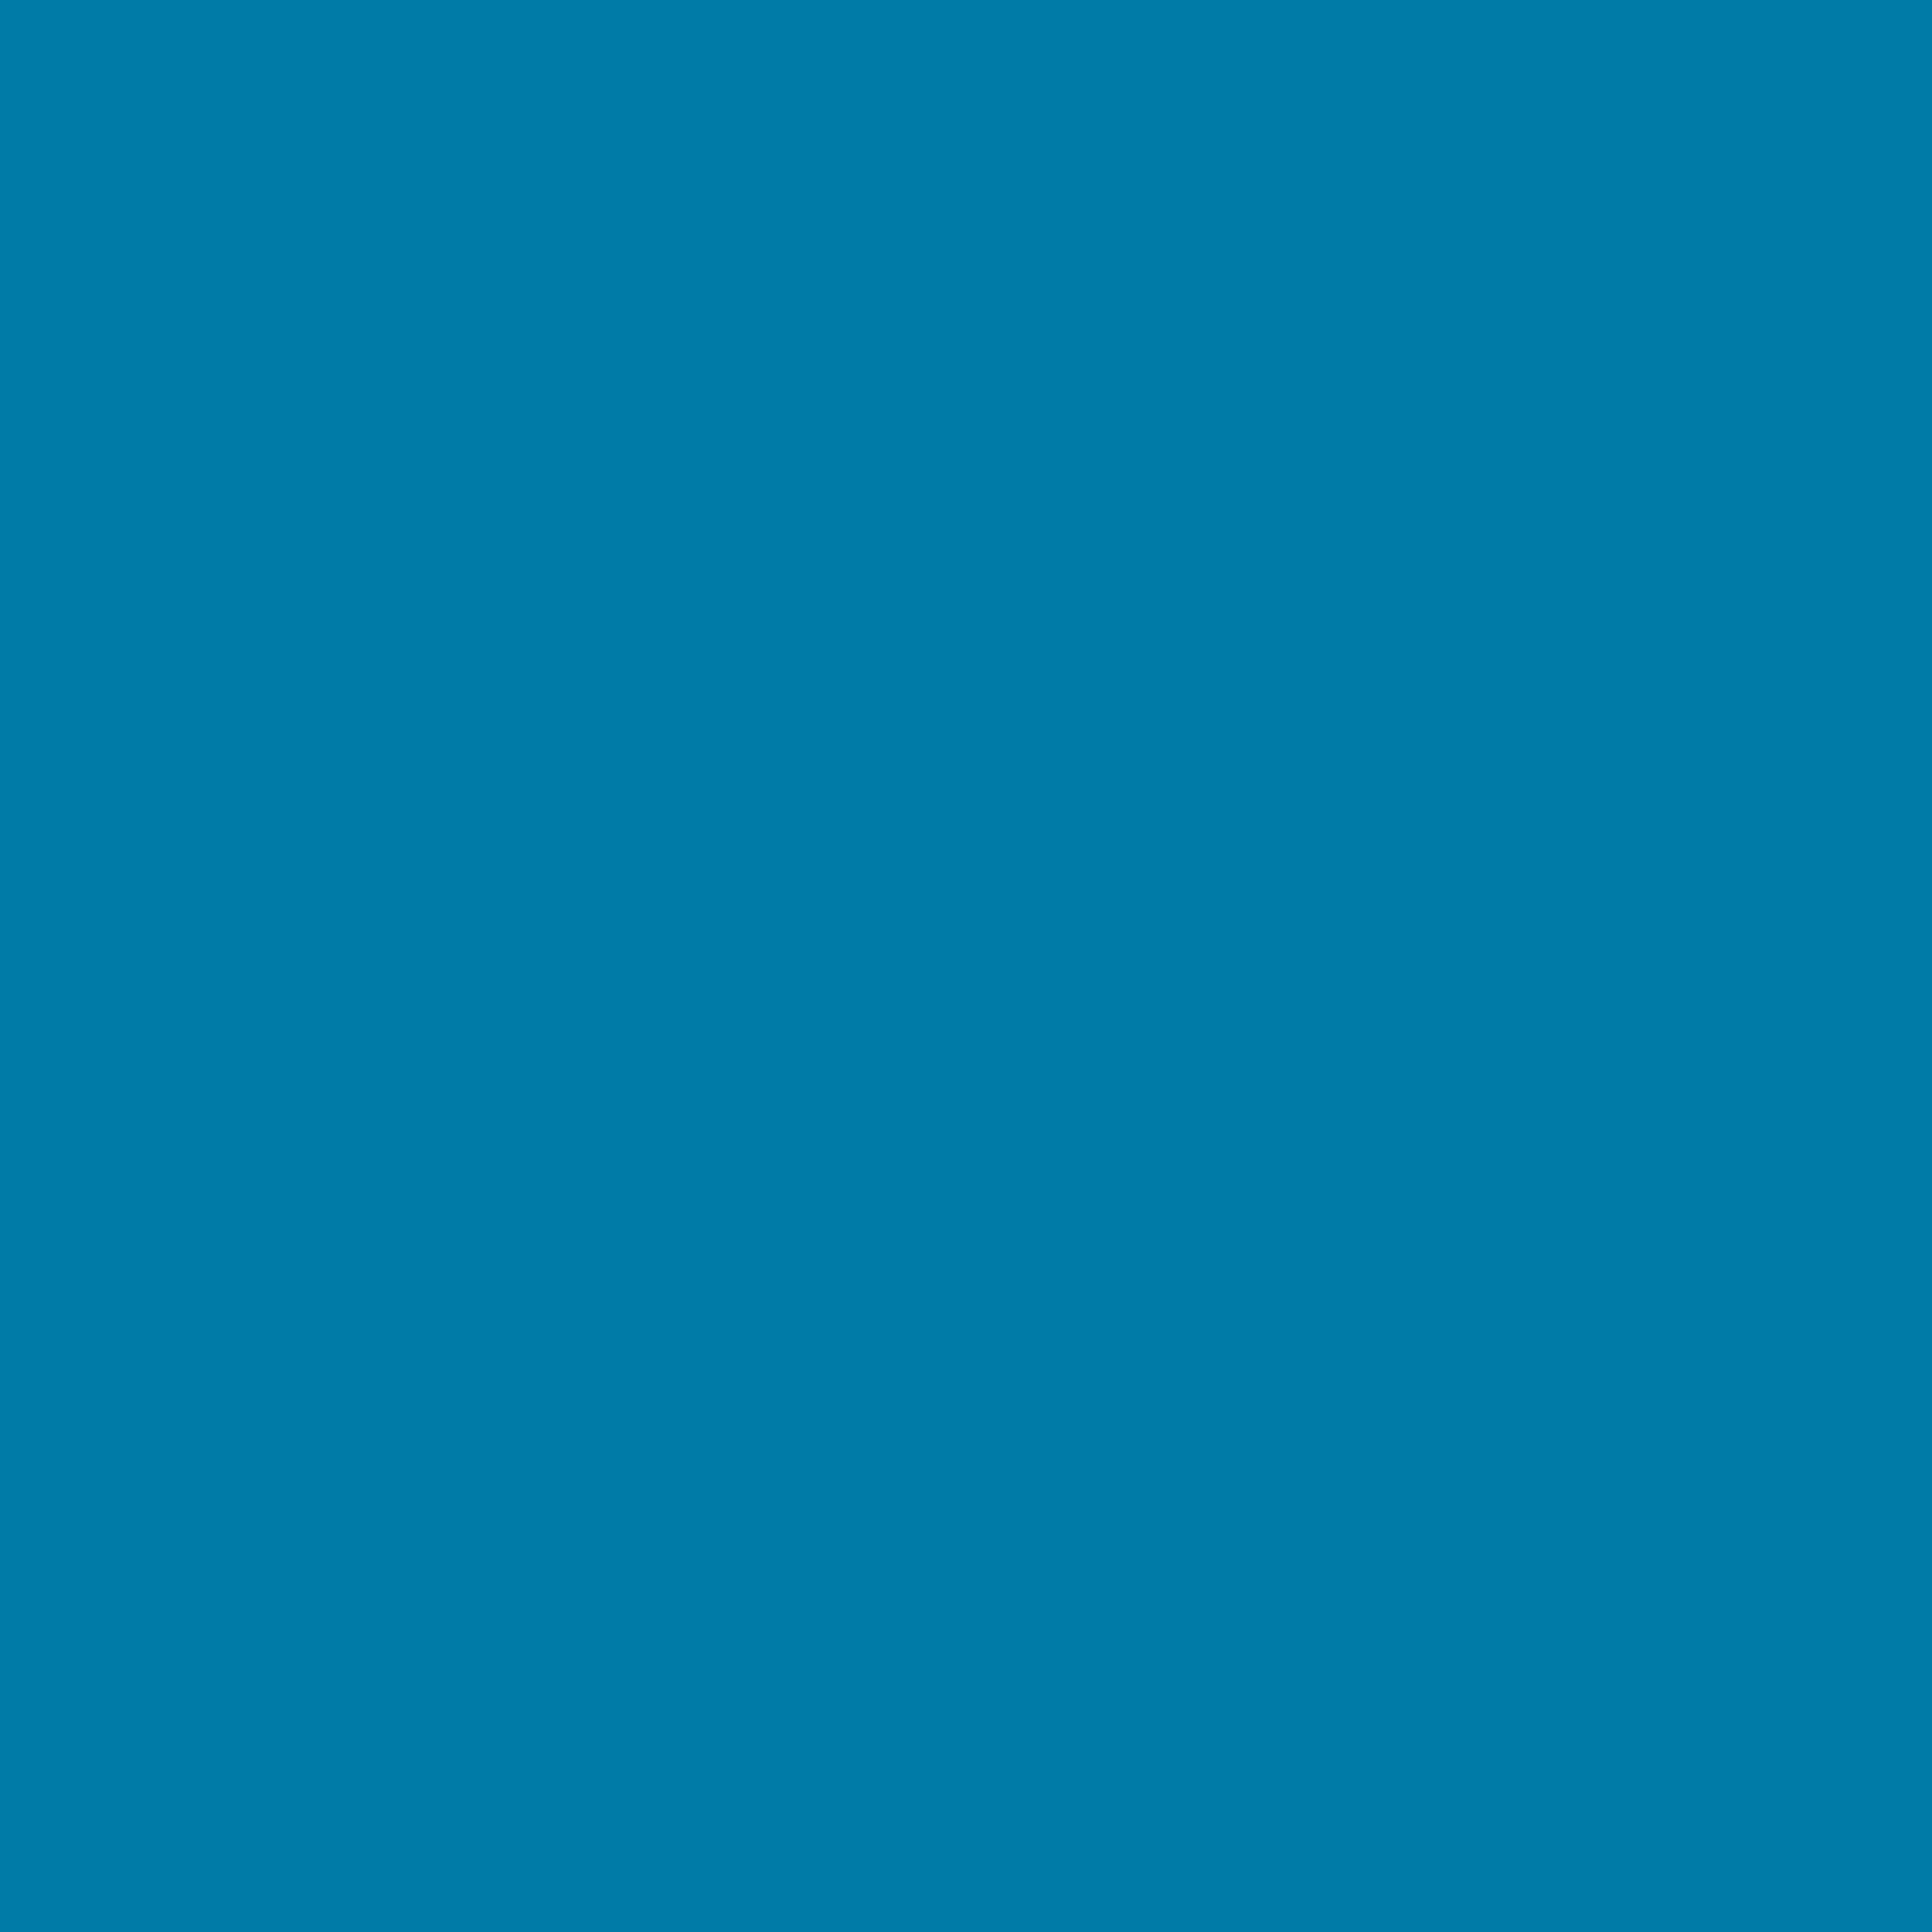 2732x2732 Celadon Blue Solid Color Background